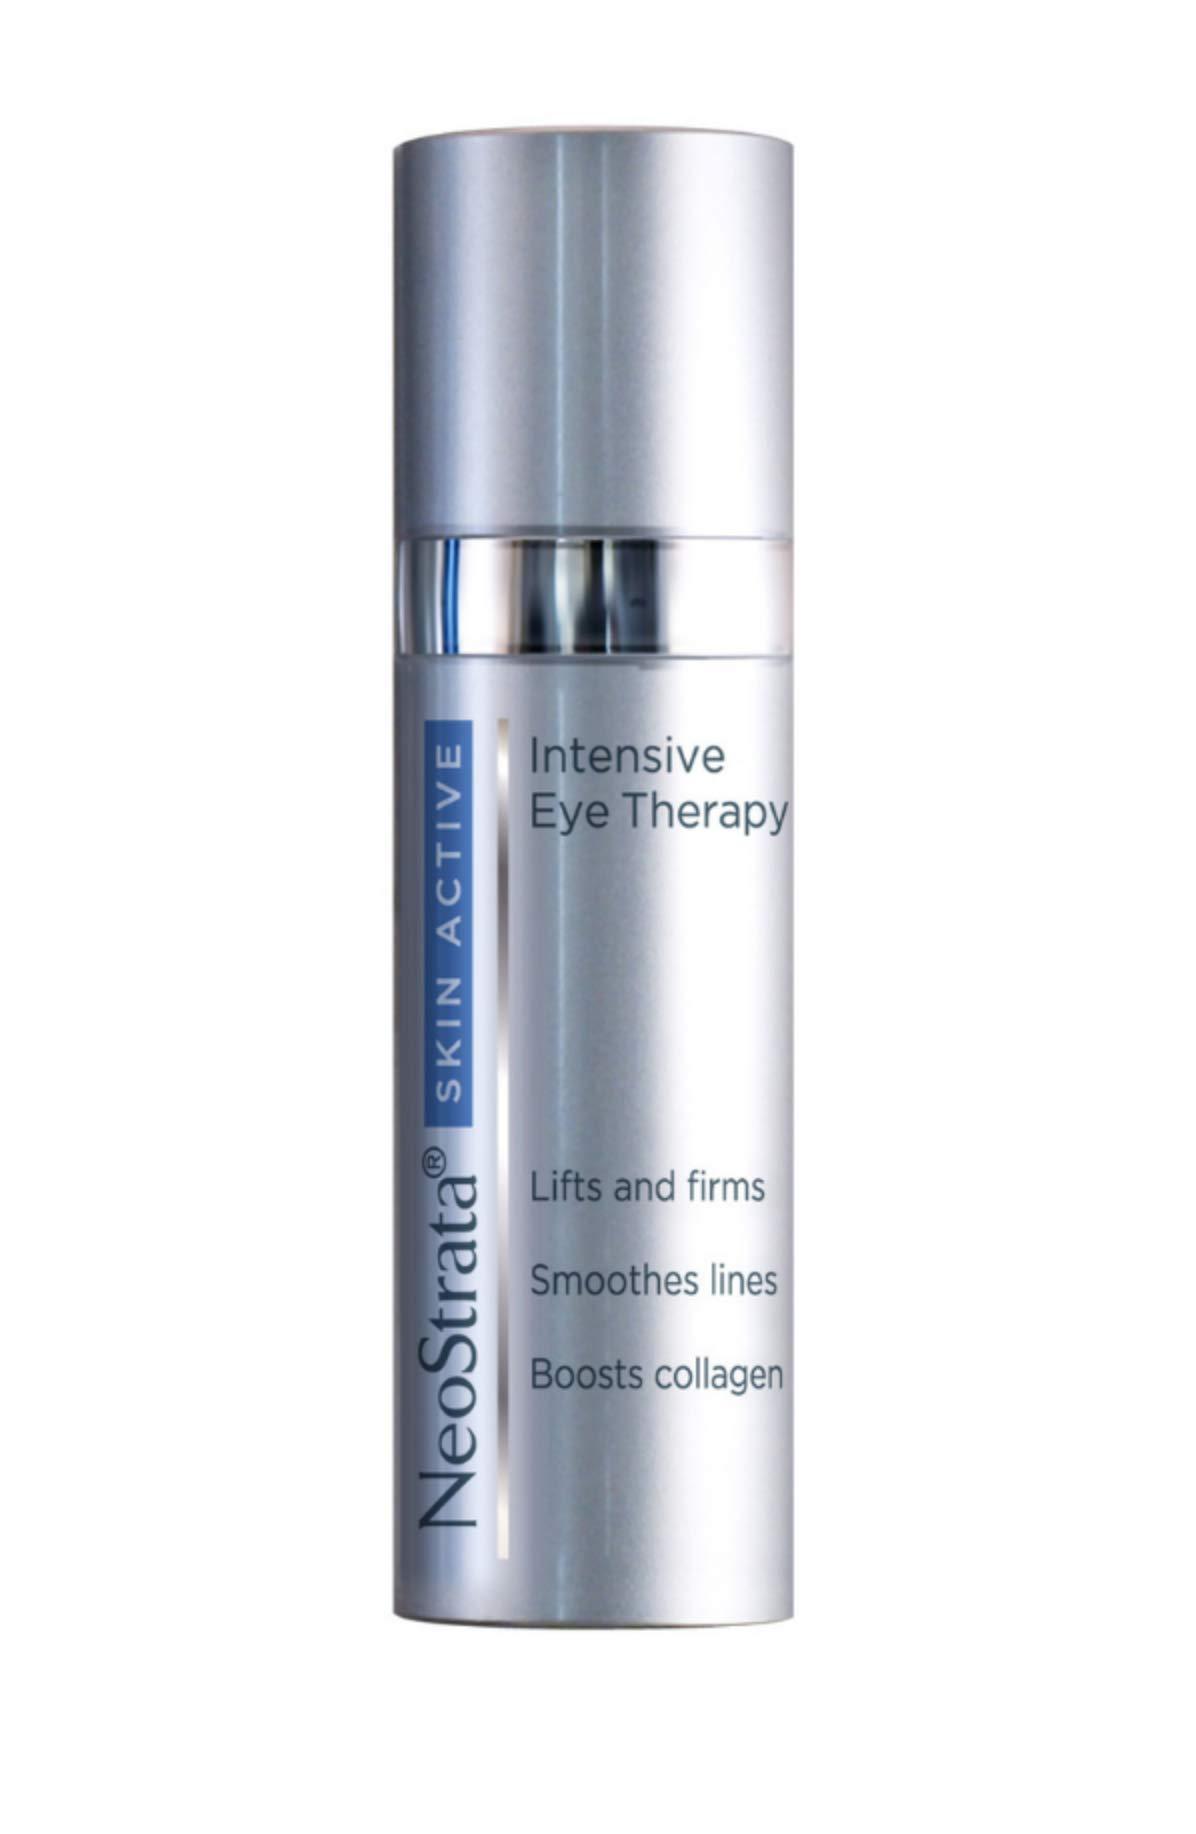 NeoStrata SKIN ACTIVE Intensive Eye Therapy, 0.5 oz